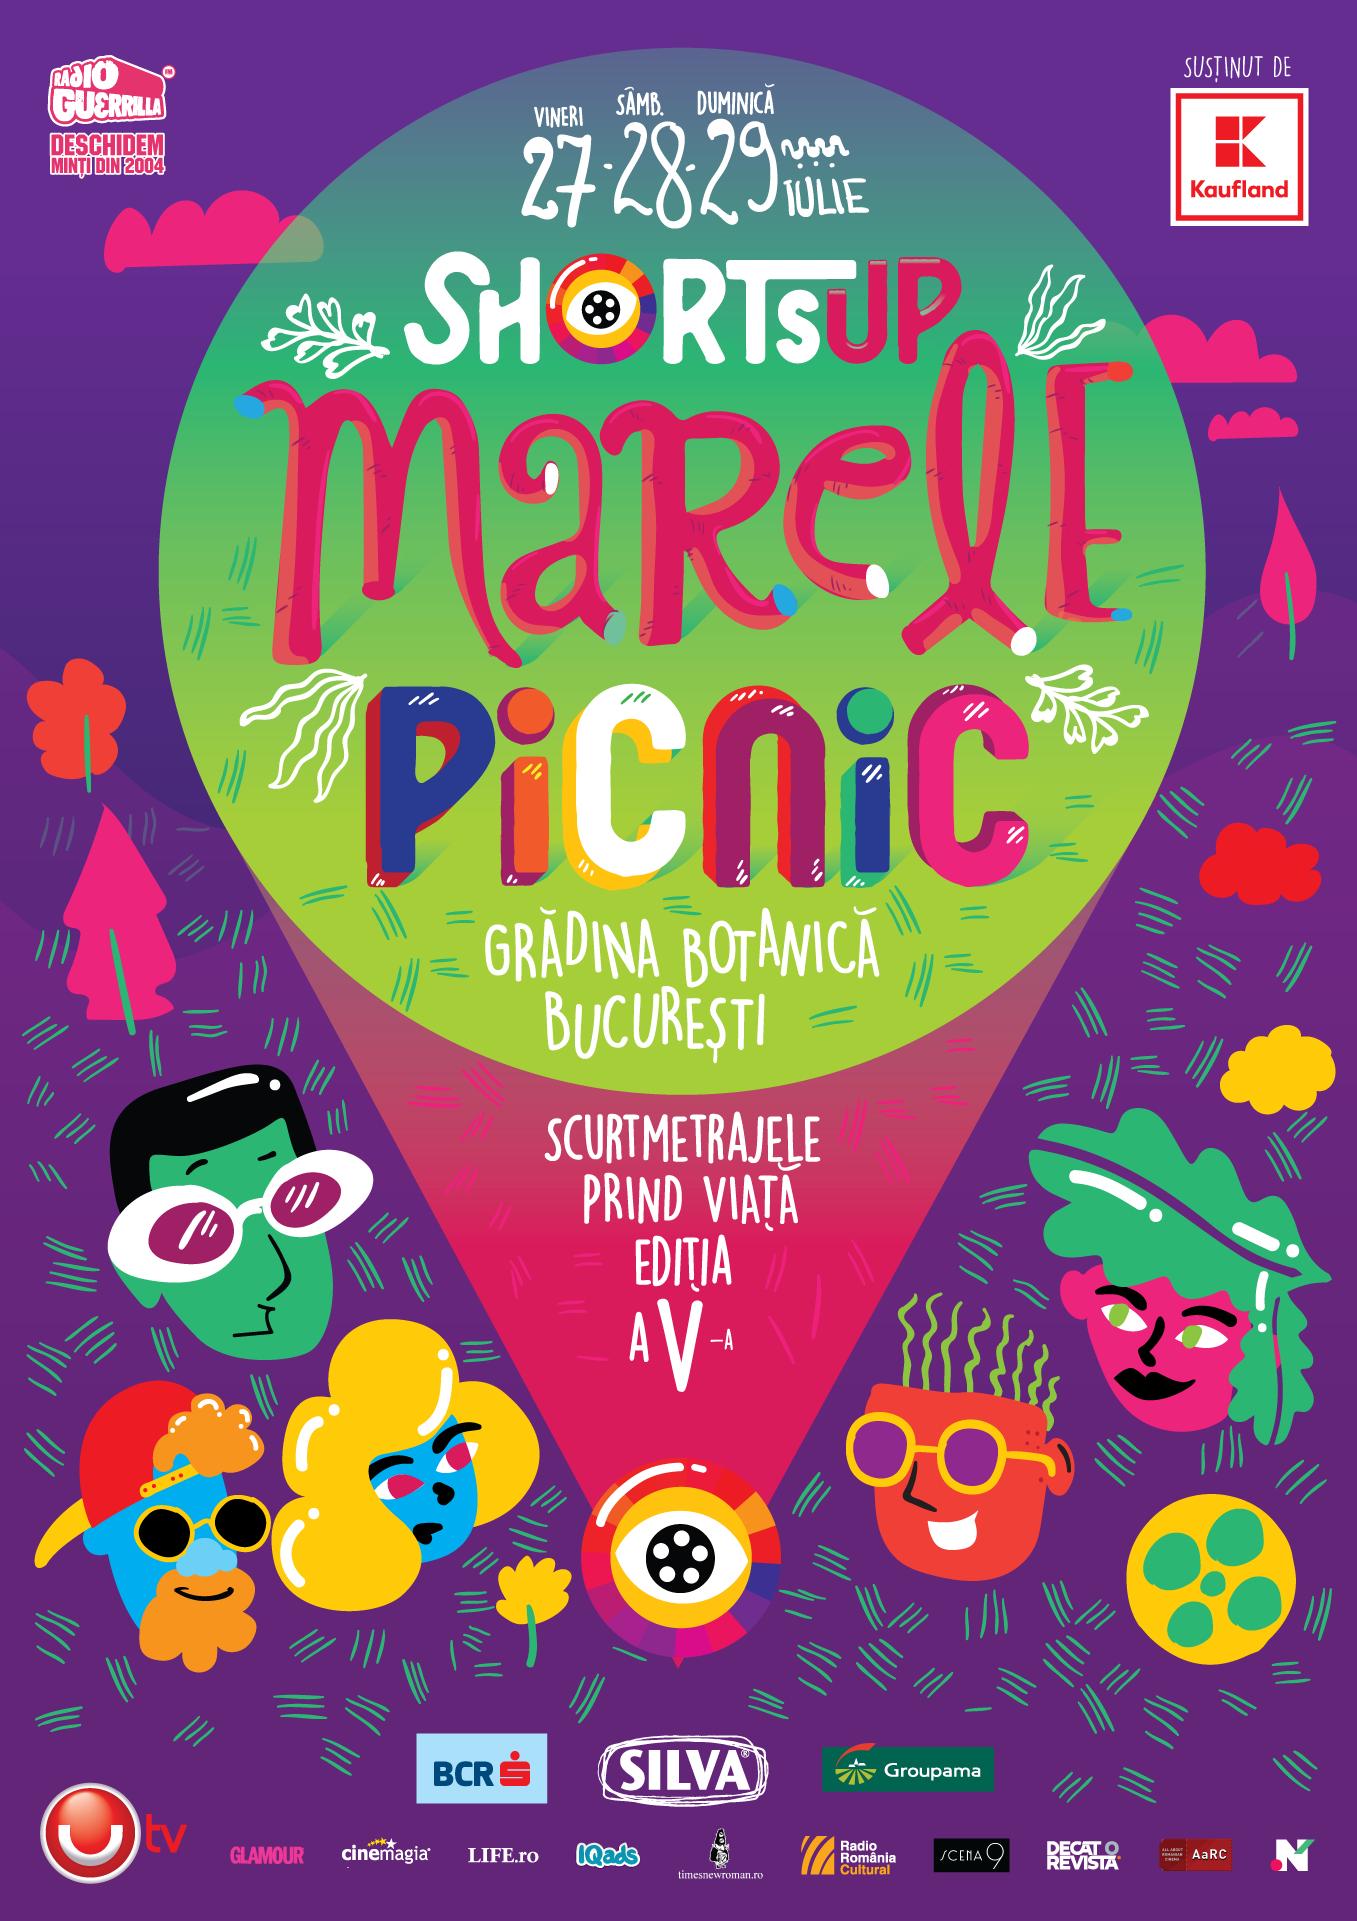 afis m picnic 2018